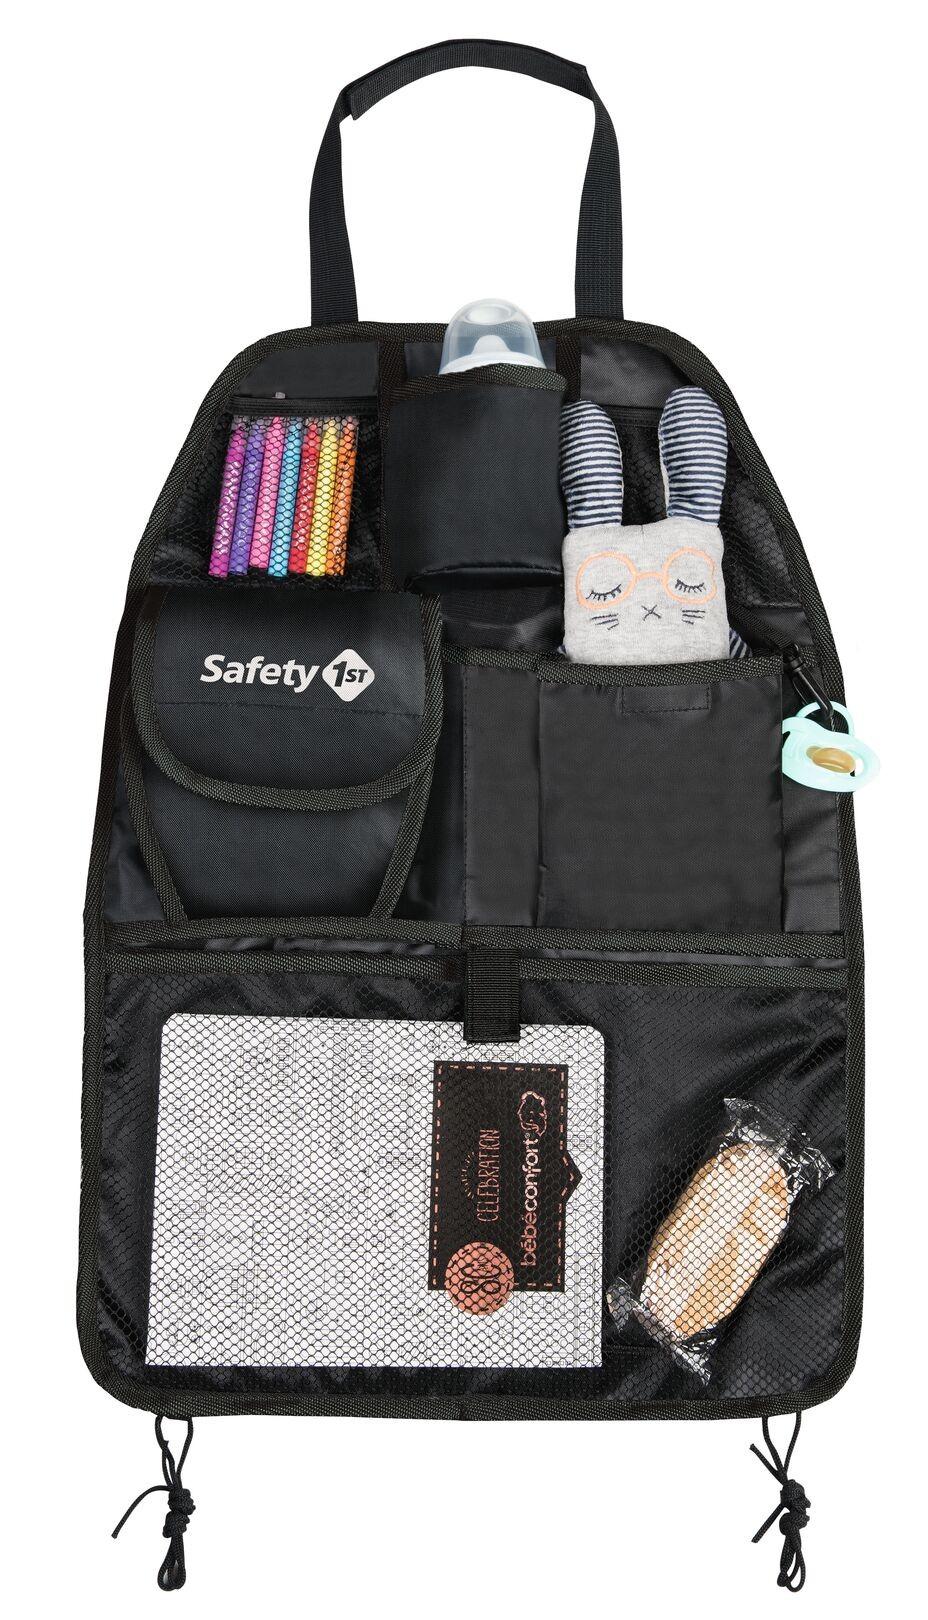 Image of Safety 1st Stoelorganiser 34945